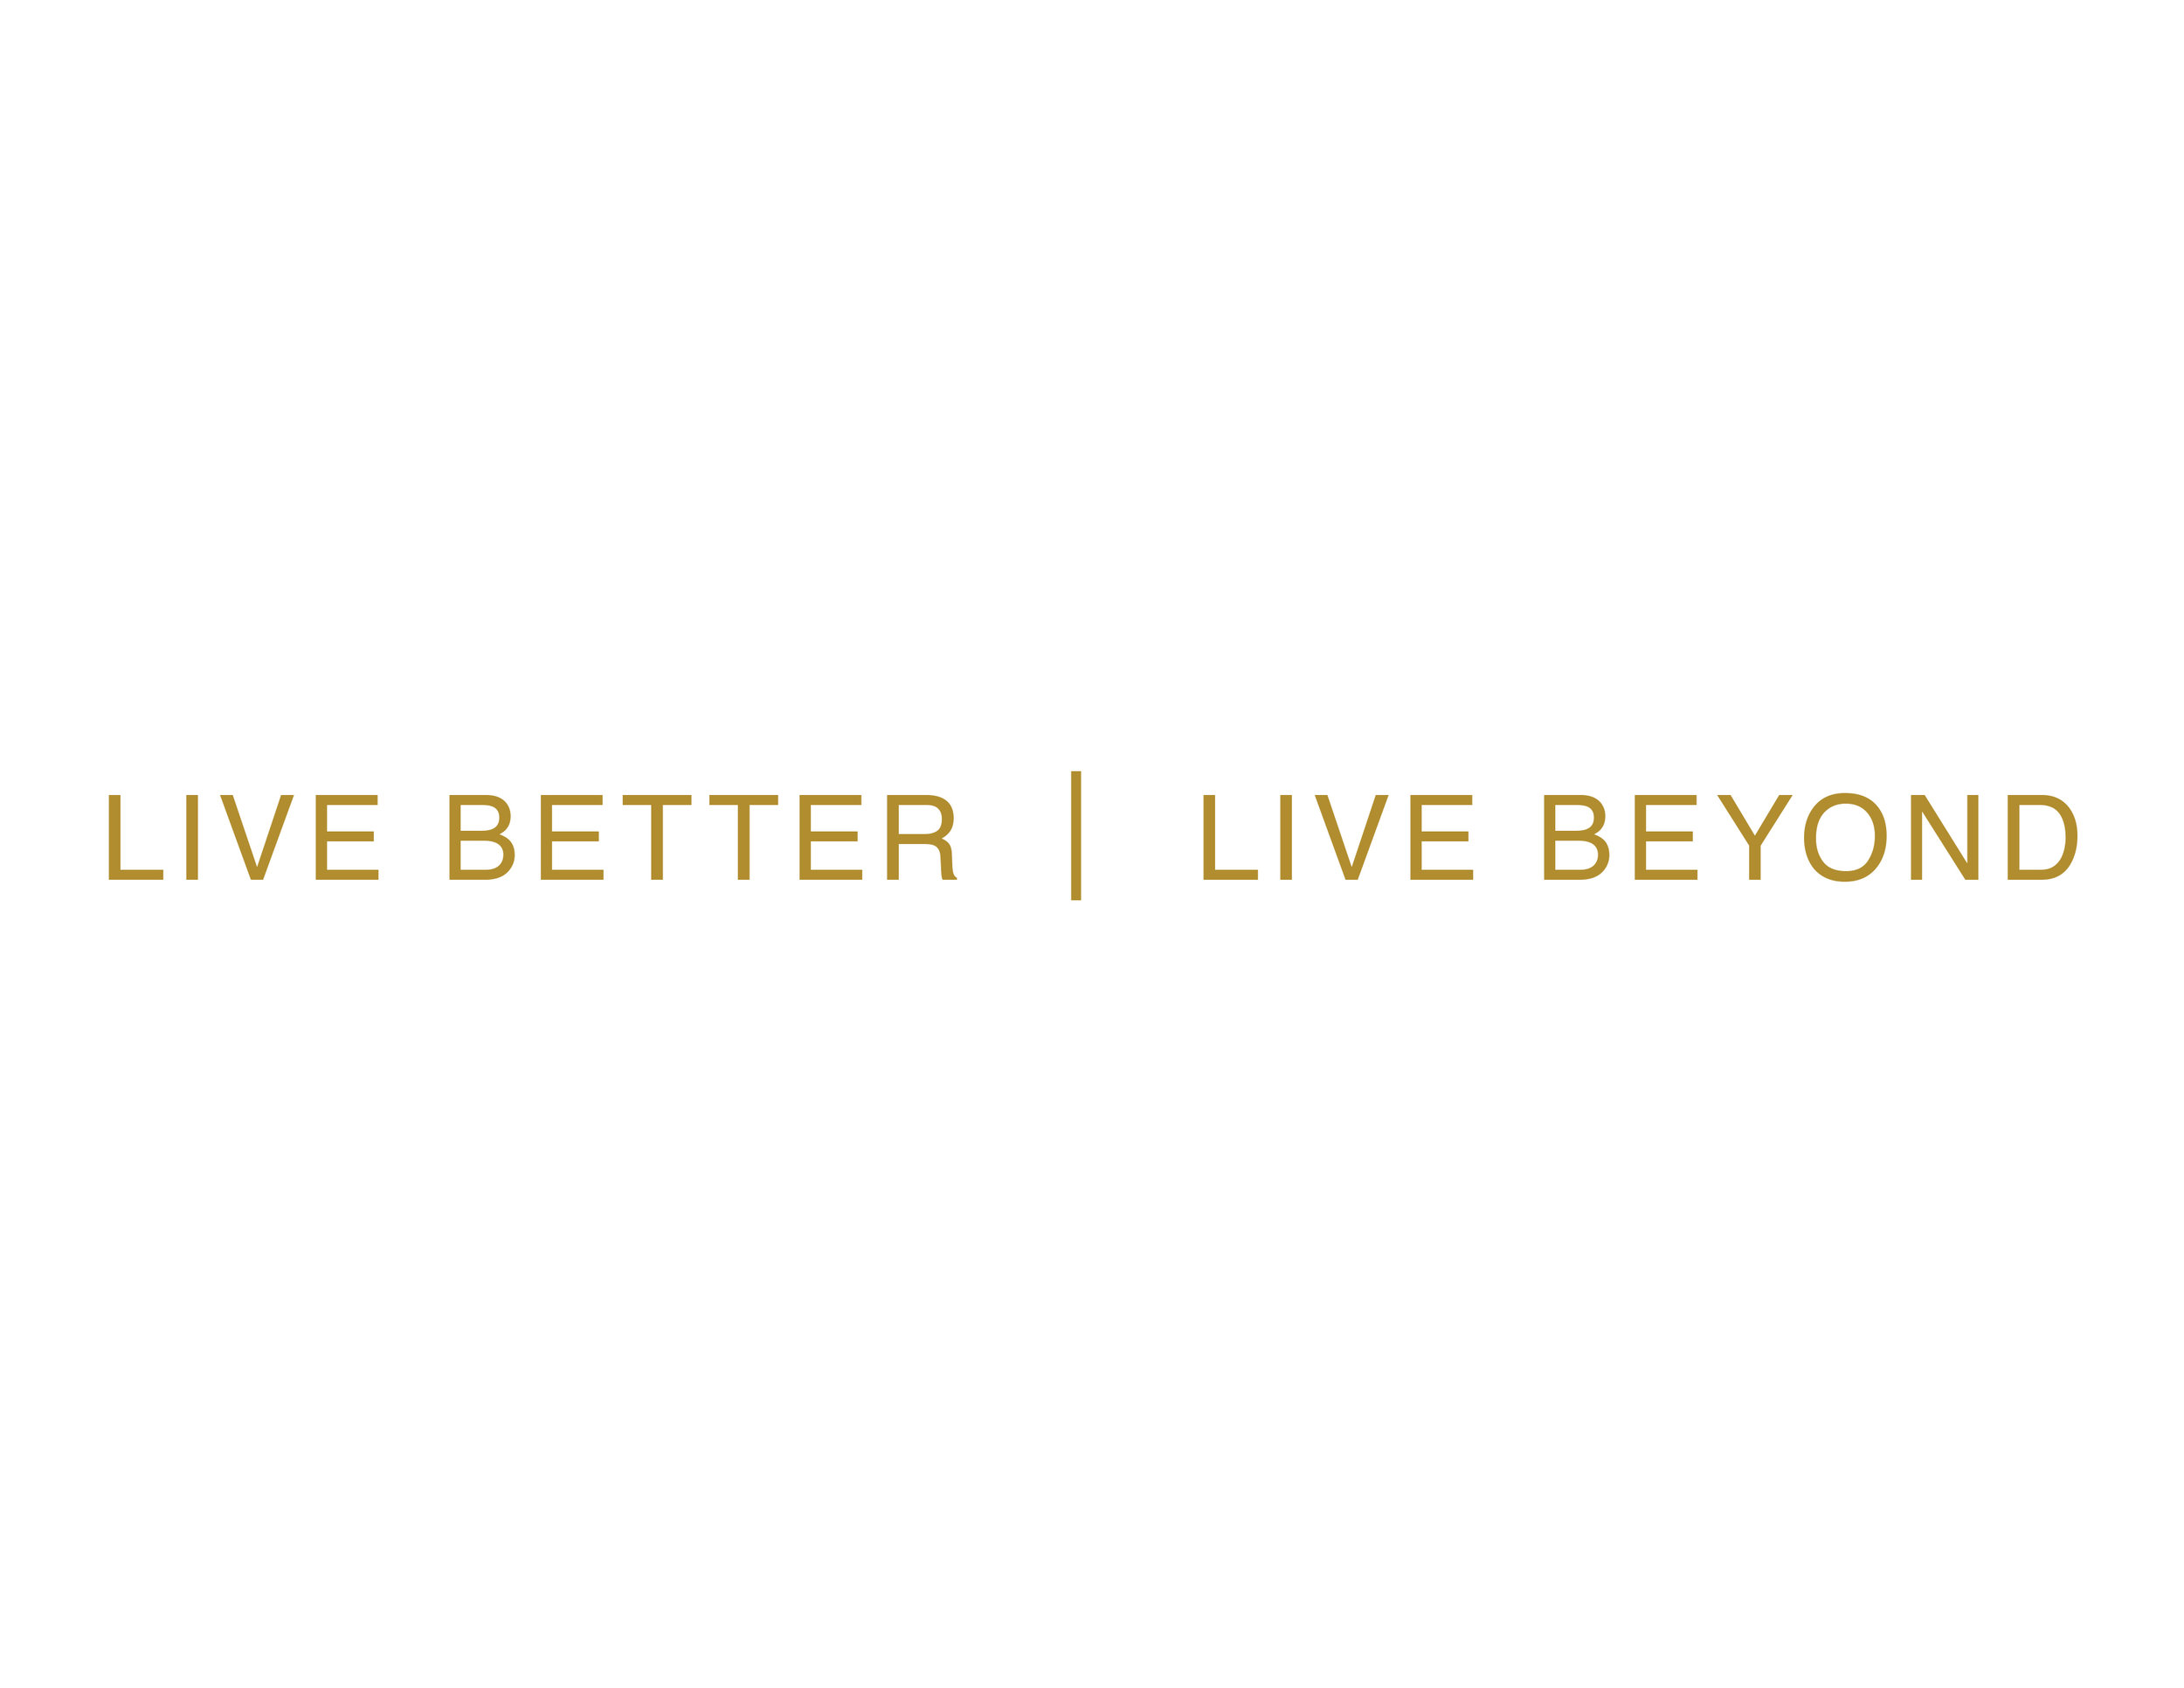 live better, live beyond.jpg